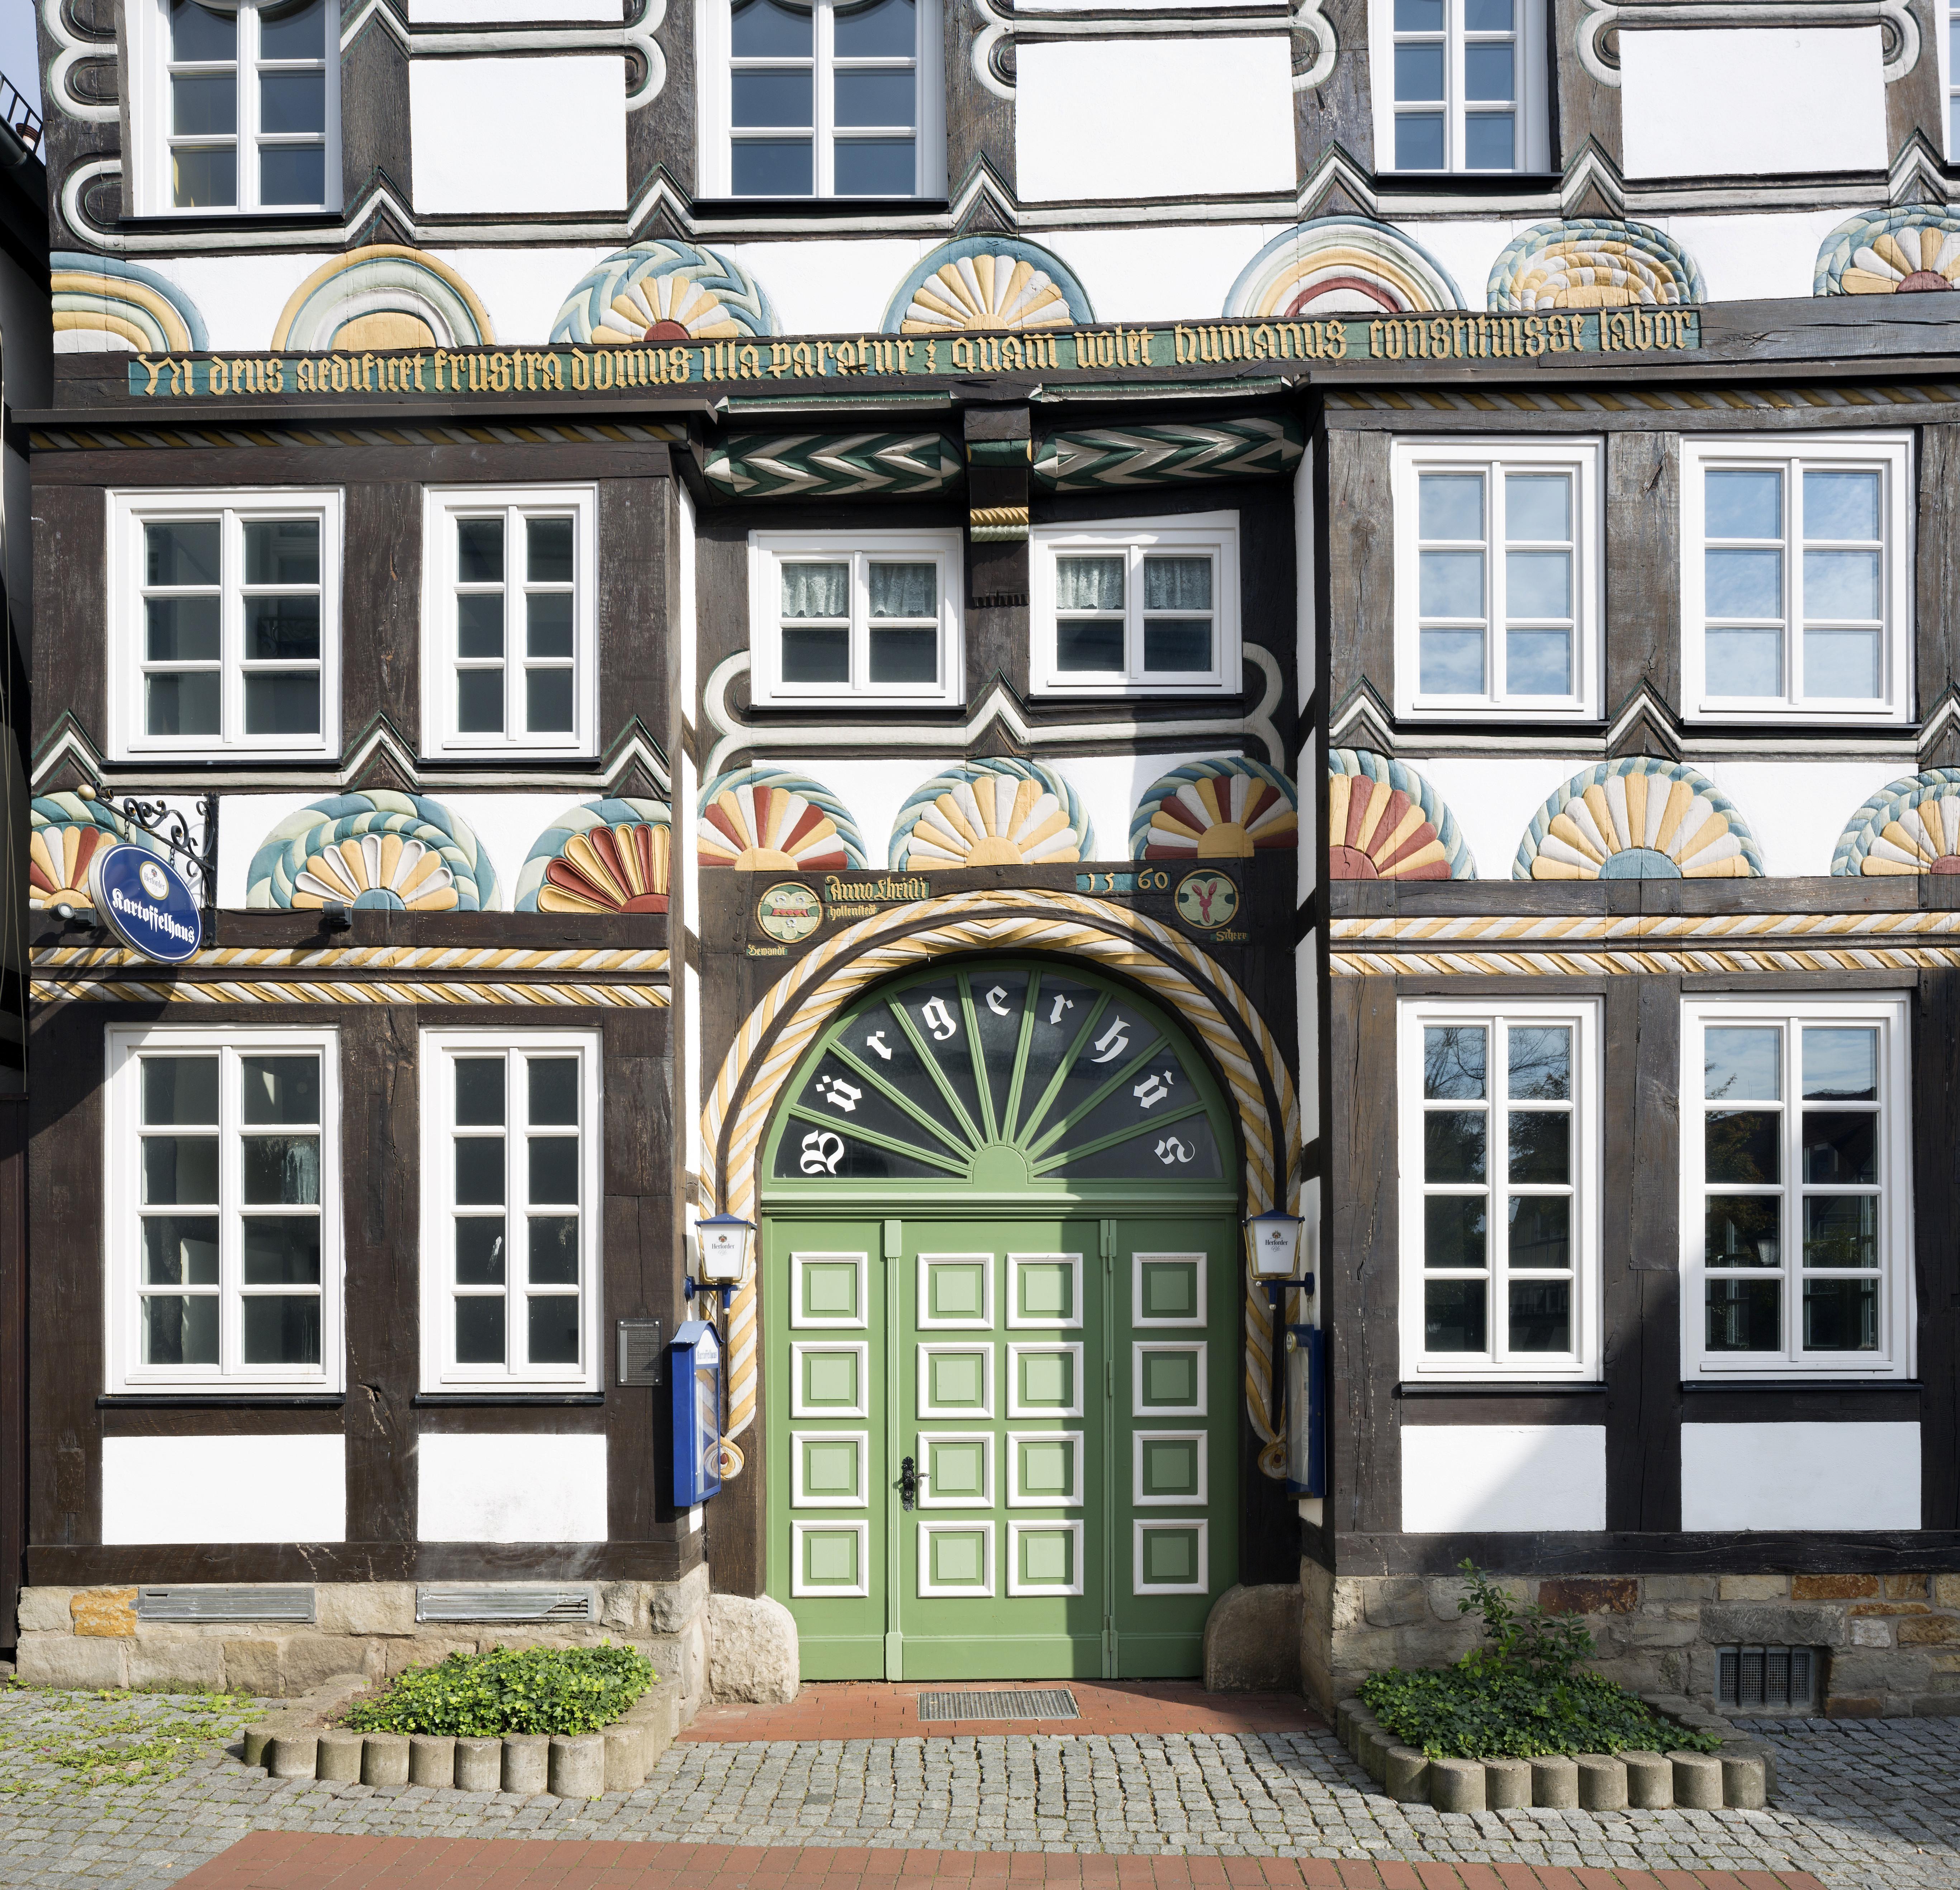 Buergerhus entrance, half-timbered house of 1560, Kupferschmiedestrasse, Hamelin historic center